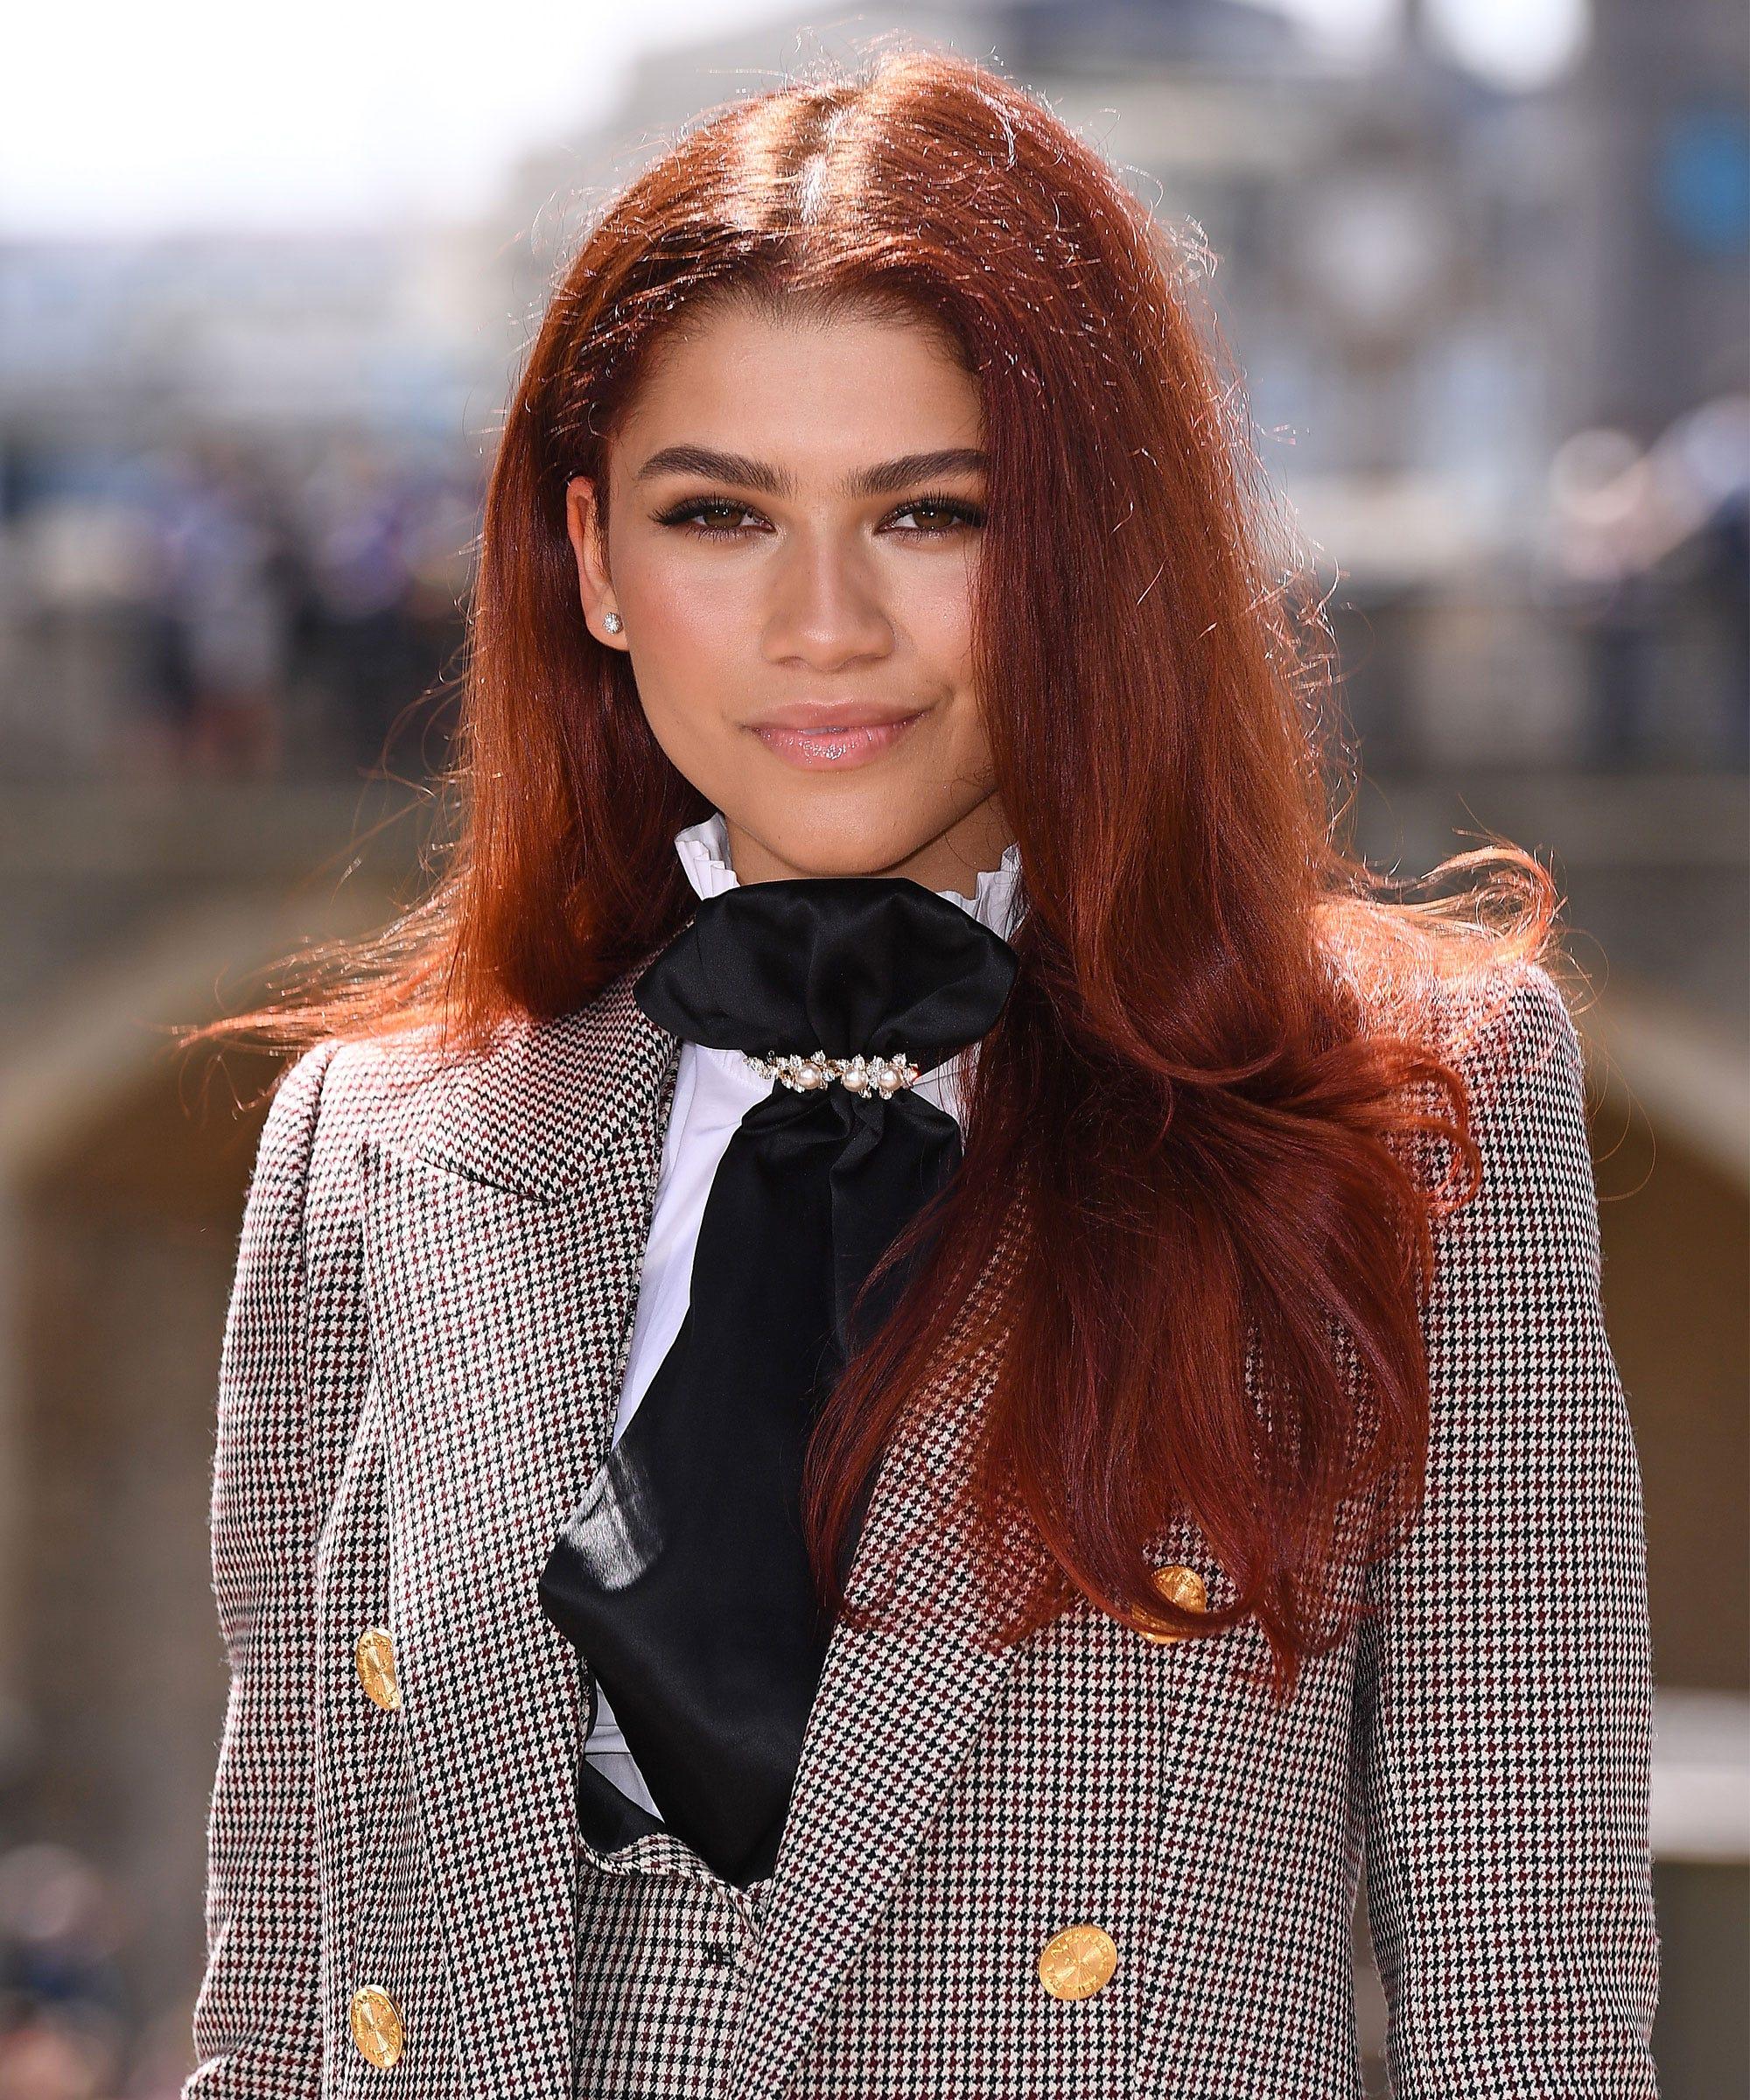 Red Hair Color On Black Women Is Huge Celeb Trend 15